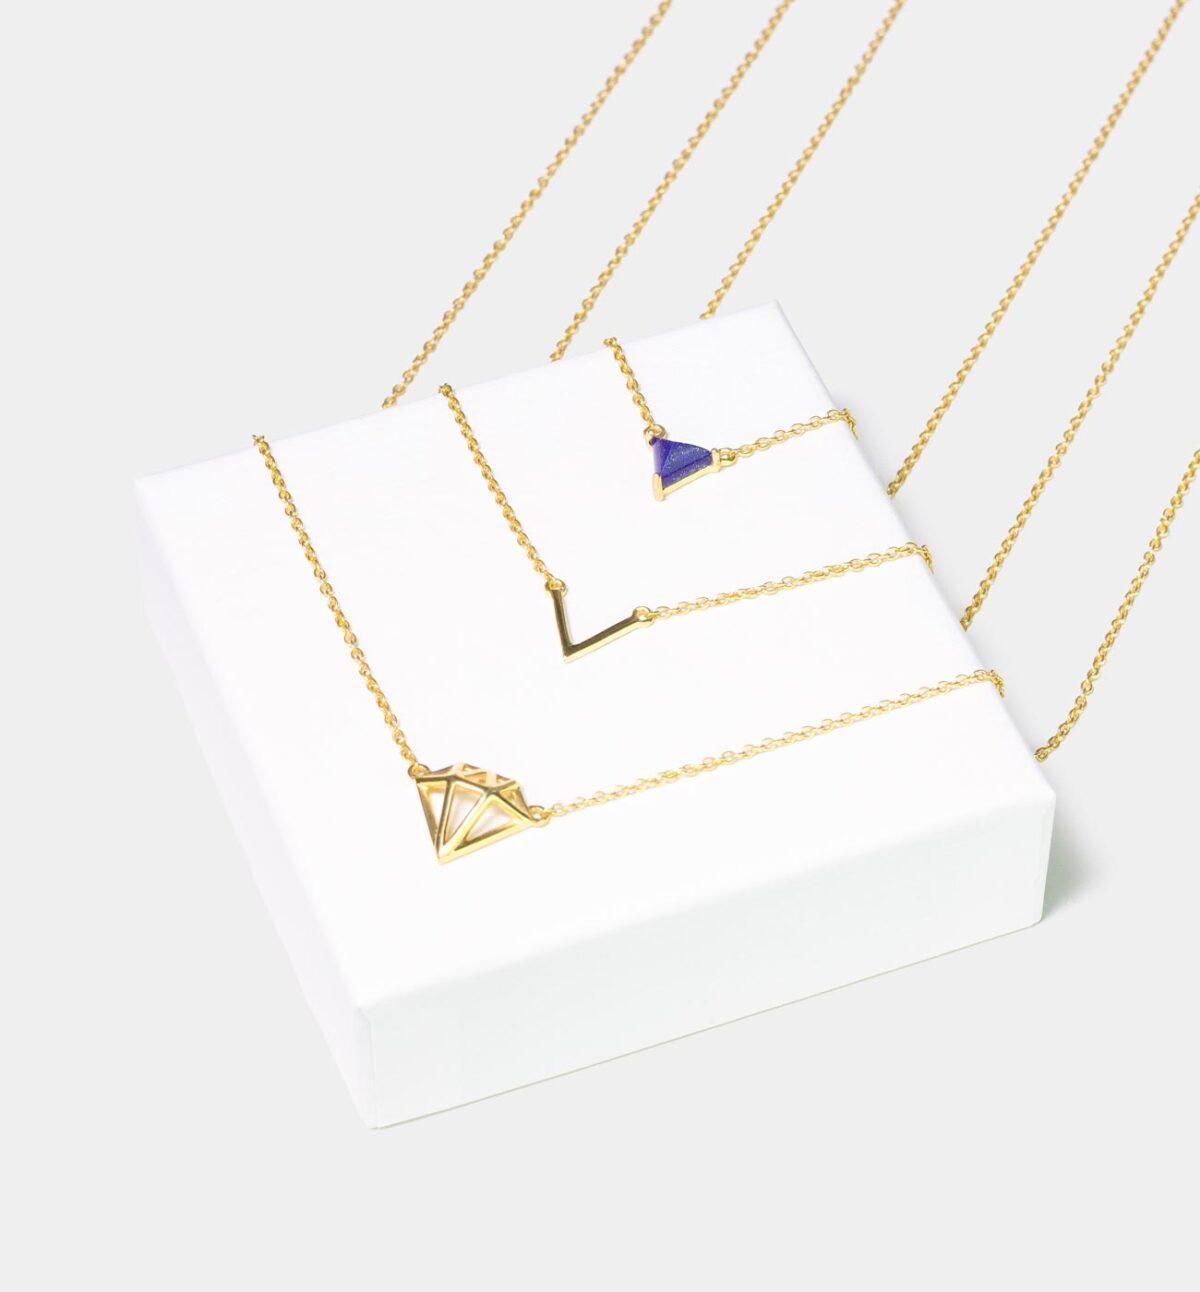 Diamond Layer Kette mit Lapislazuli